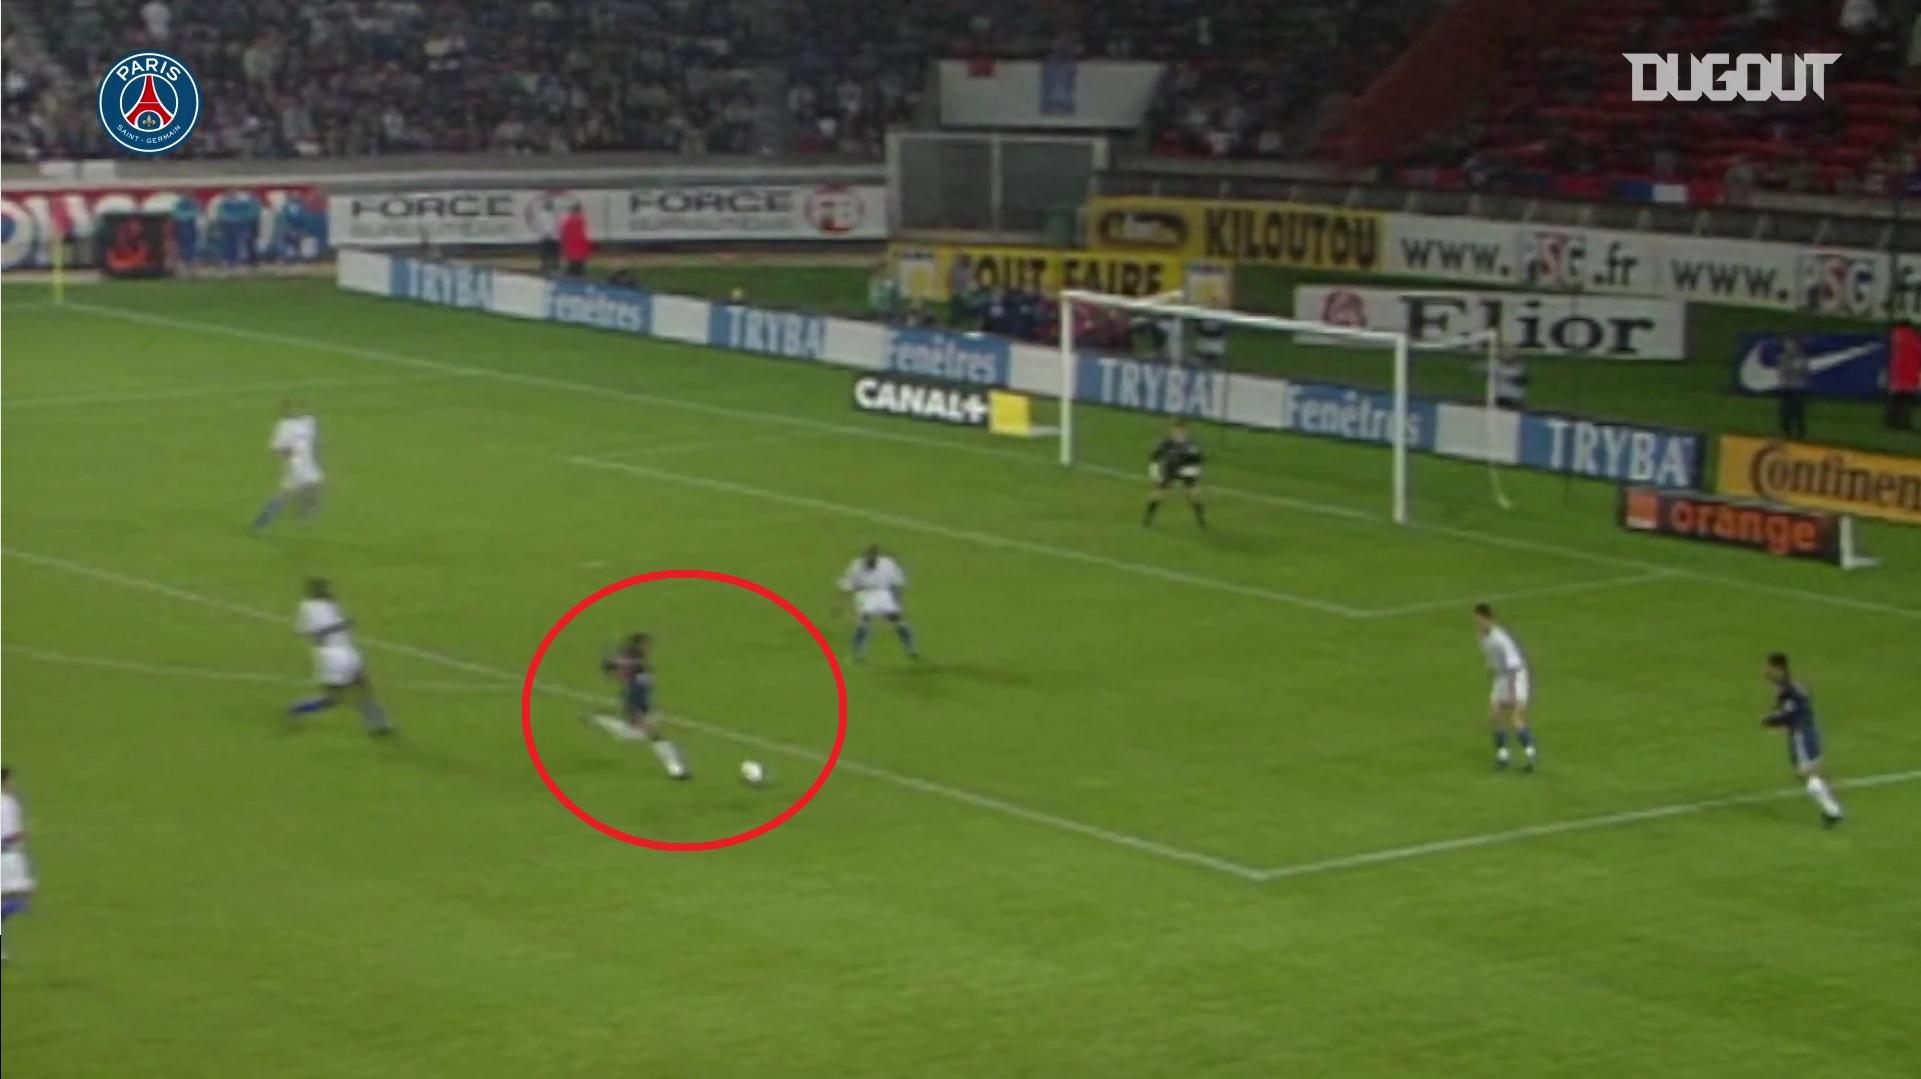 Football - Coupe de France - Lyon-PSG : le missile pleine lucarne de Jay-Jay Okocha en 2001